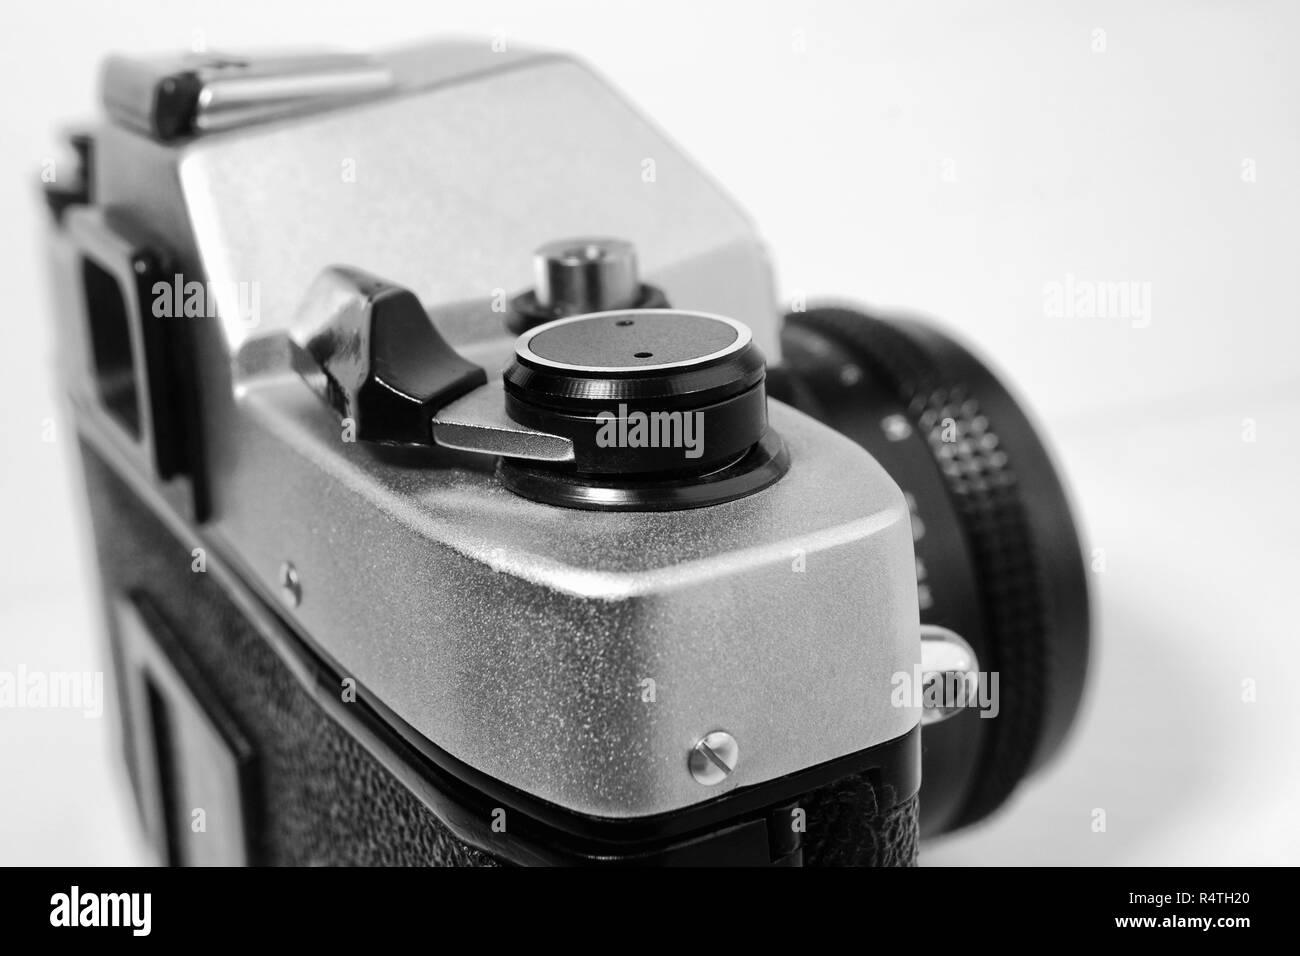 Vintage camera film rewinder lever Shallow depth of field - Stock Image